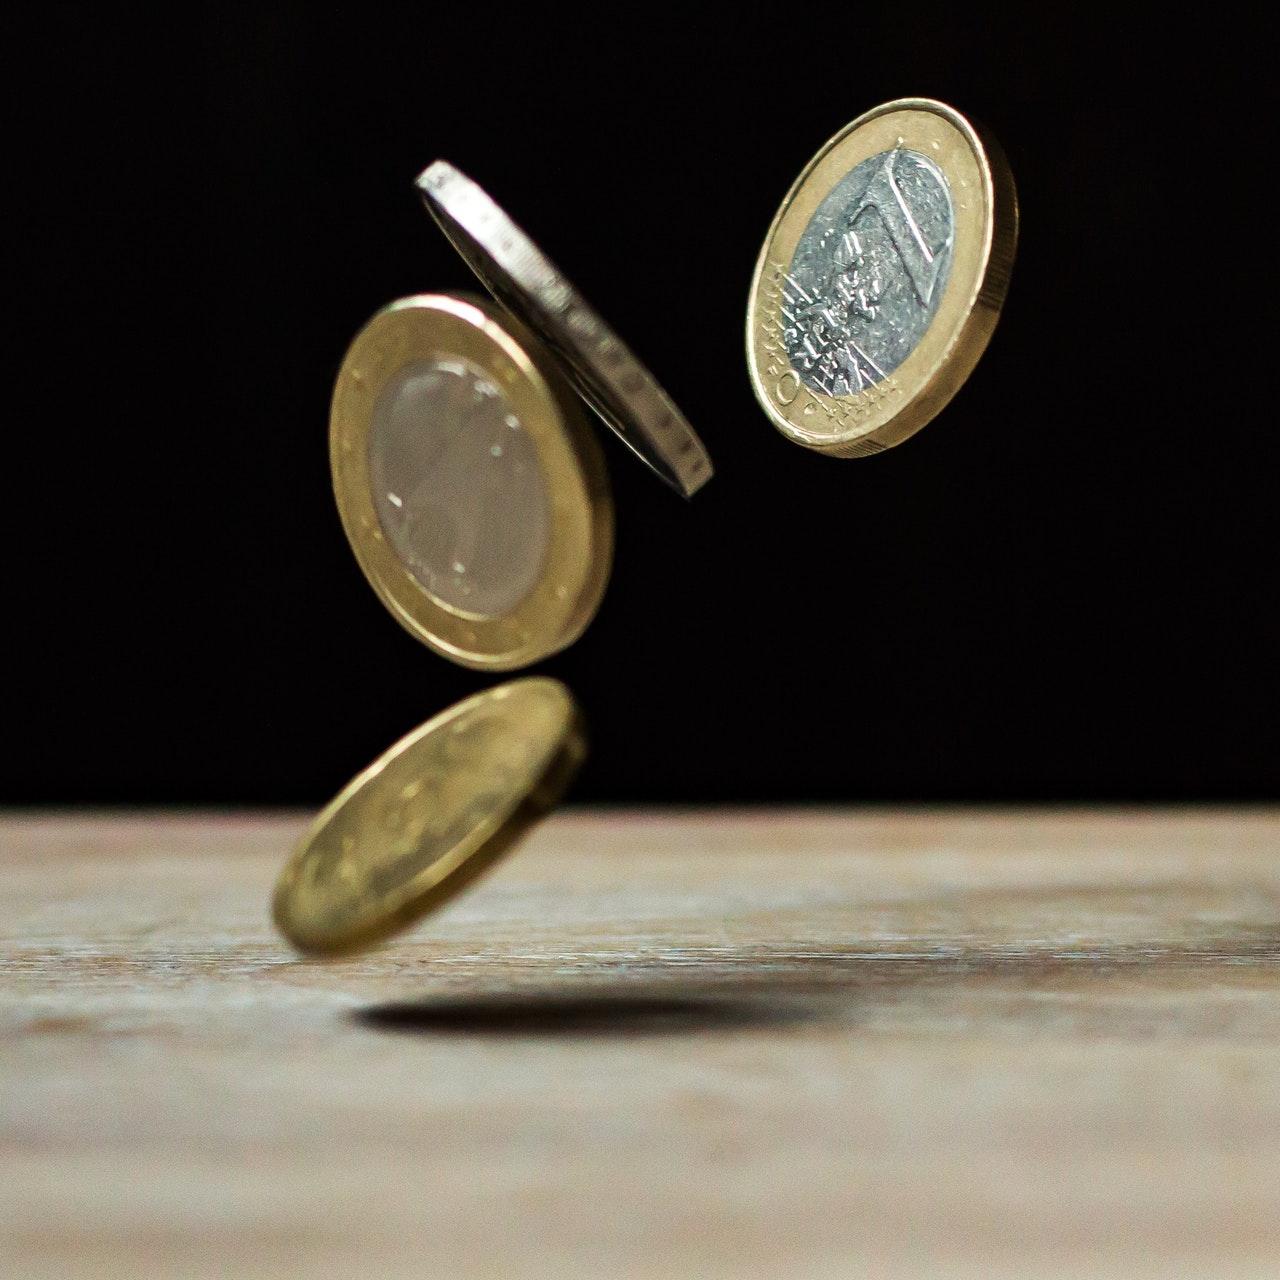 elake-elakejarjestelma-elo-yel-raha-yrittajat